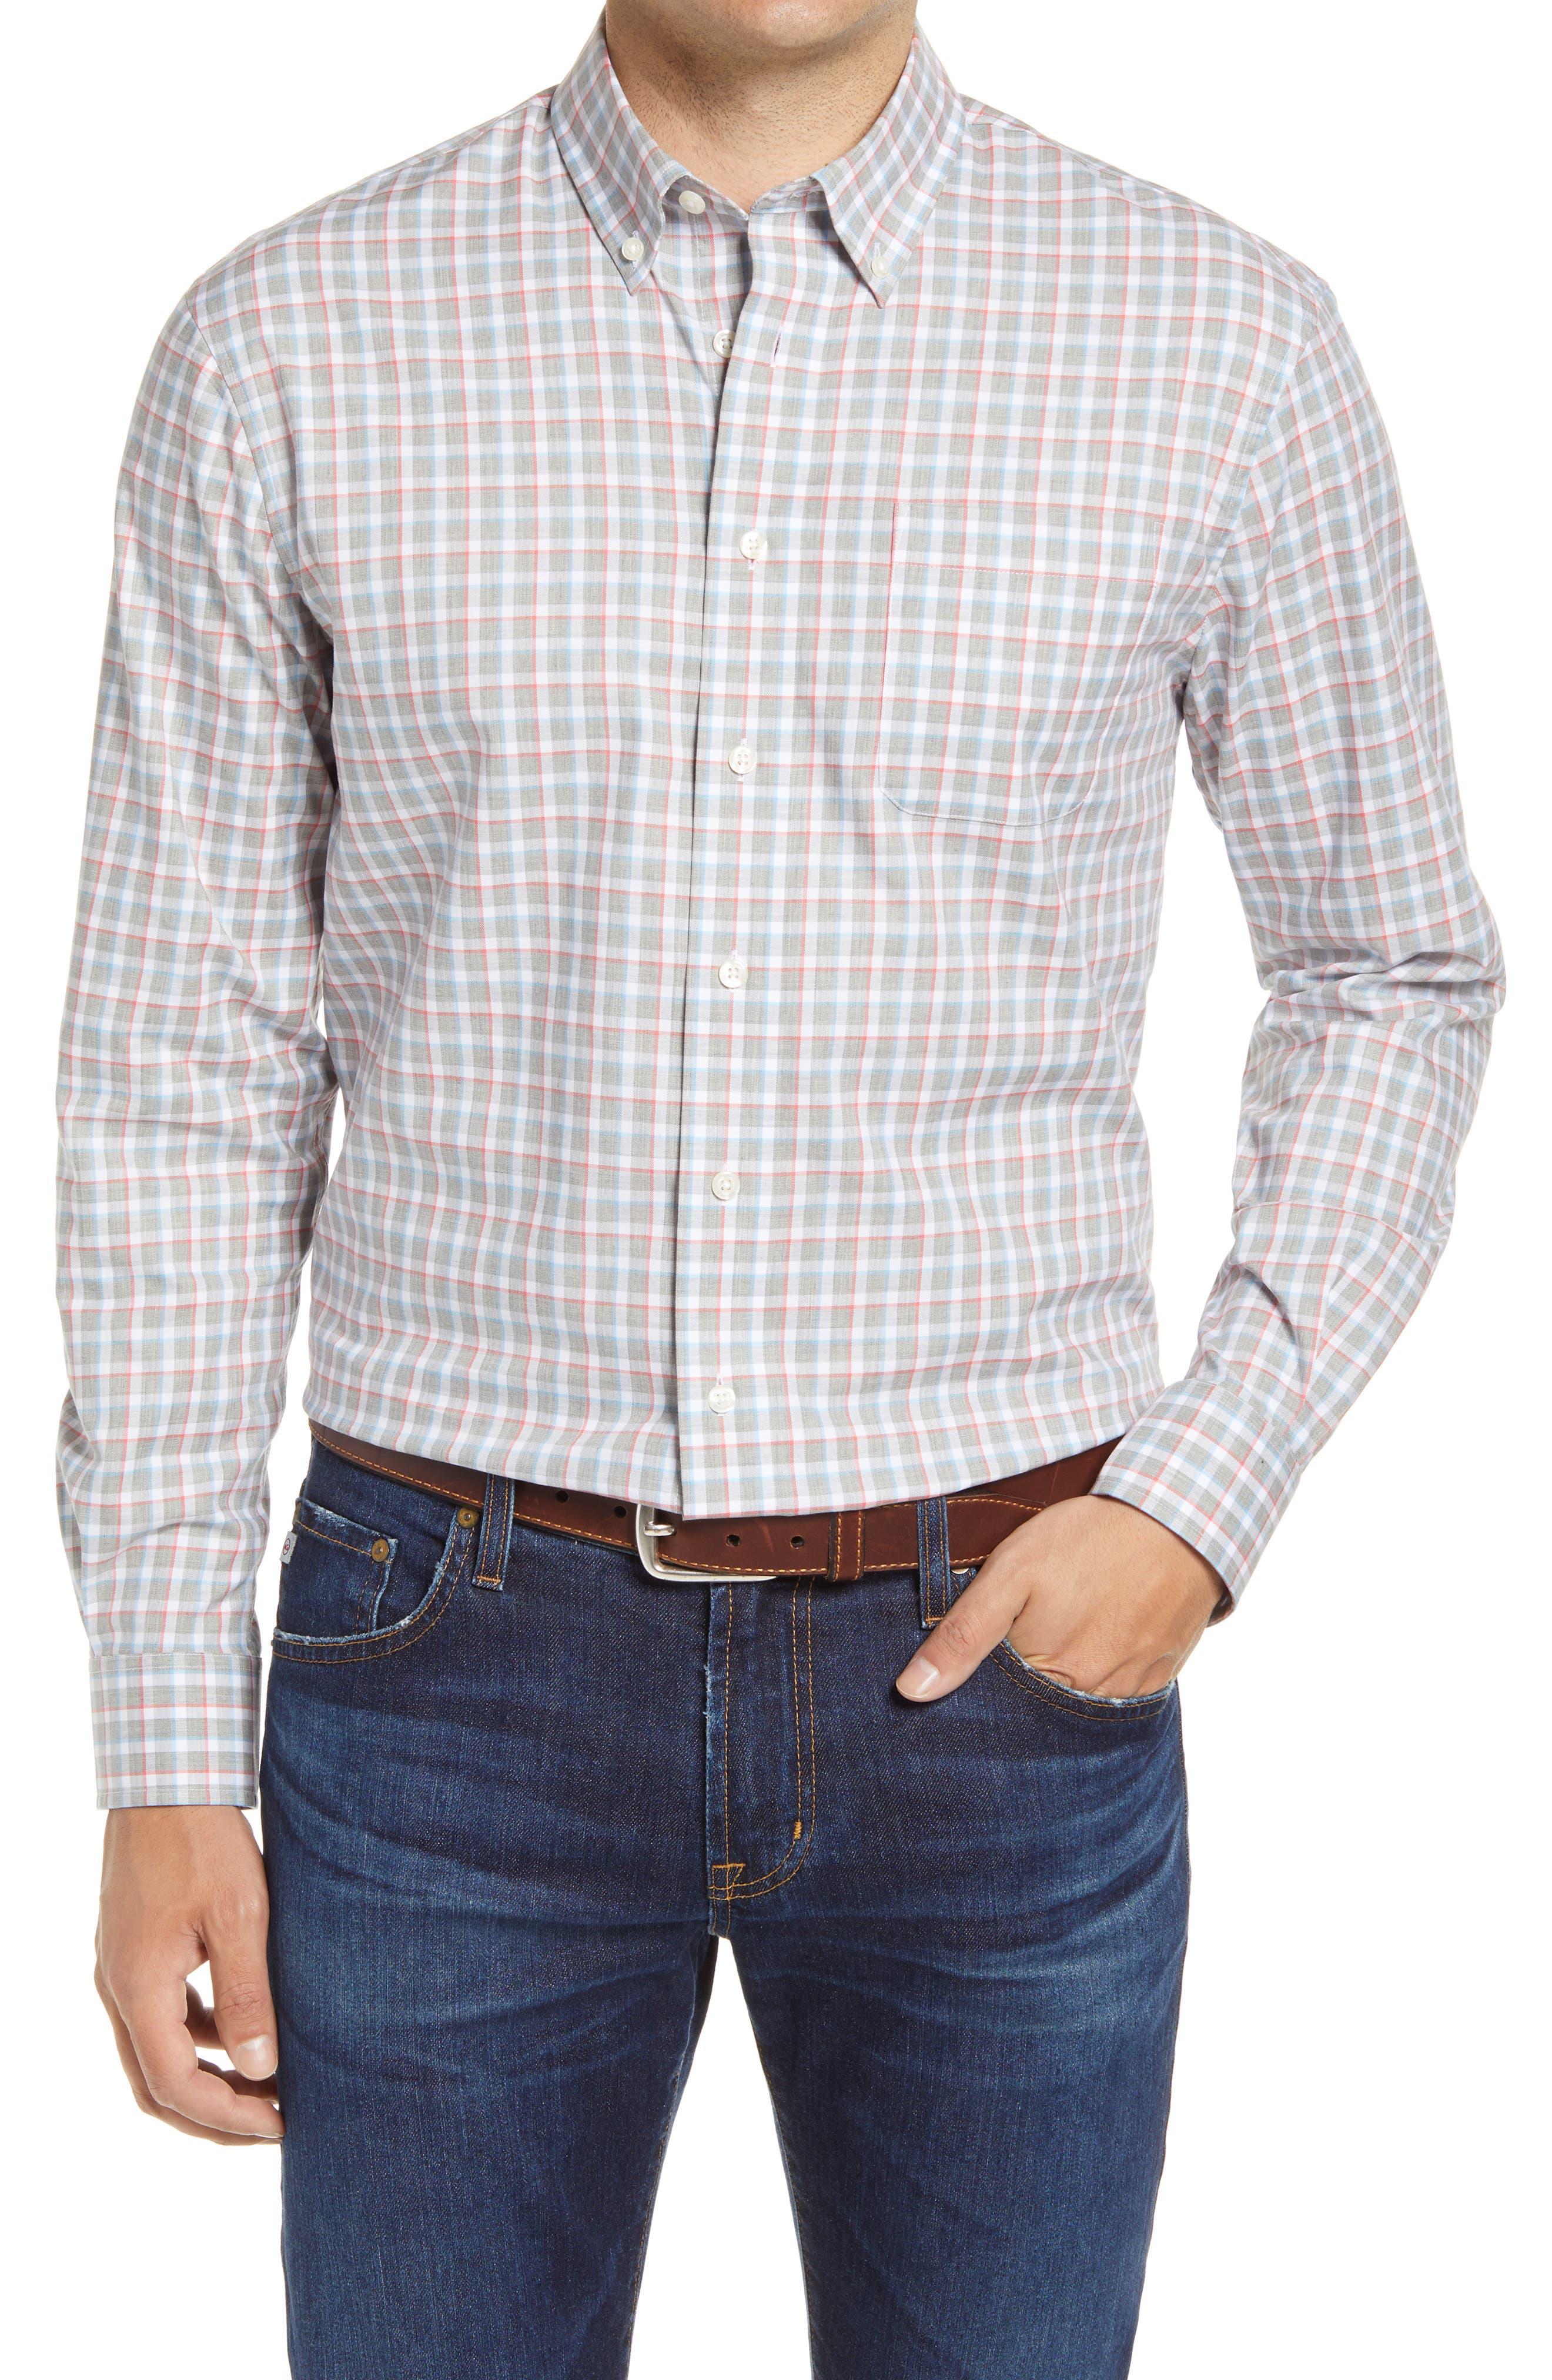 Curtis Classic Fit Plaid Button-Down Shirt